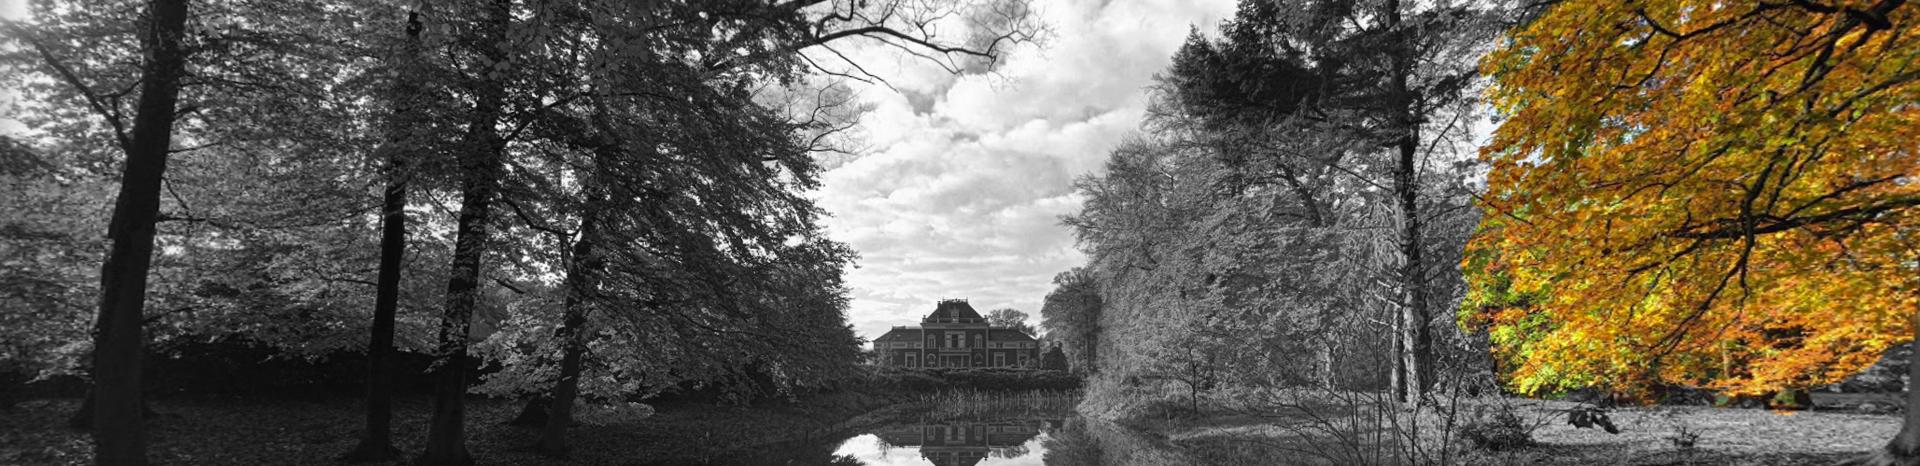 Letselschade Advocaat Bilthoven | LetselPro